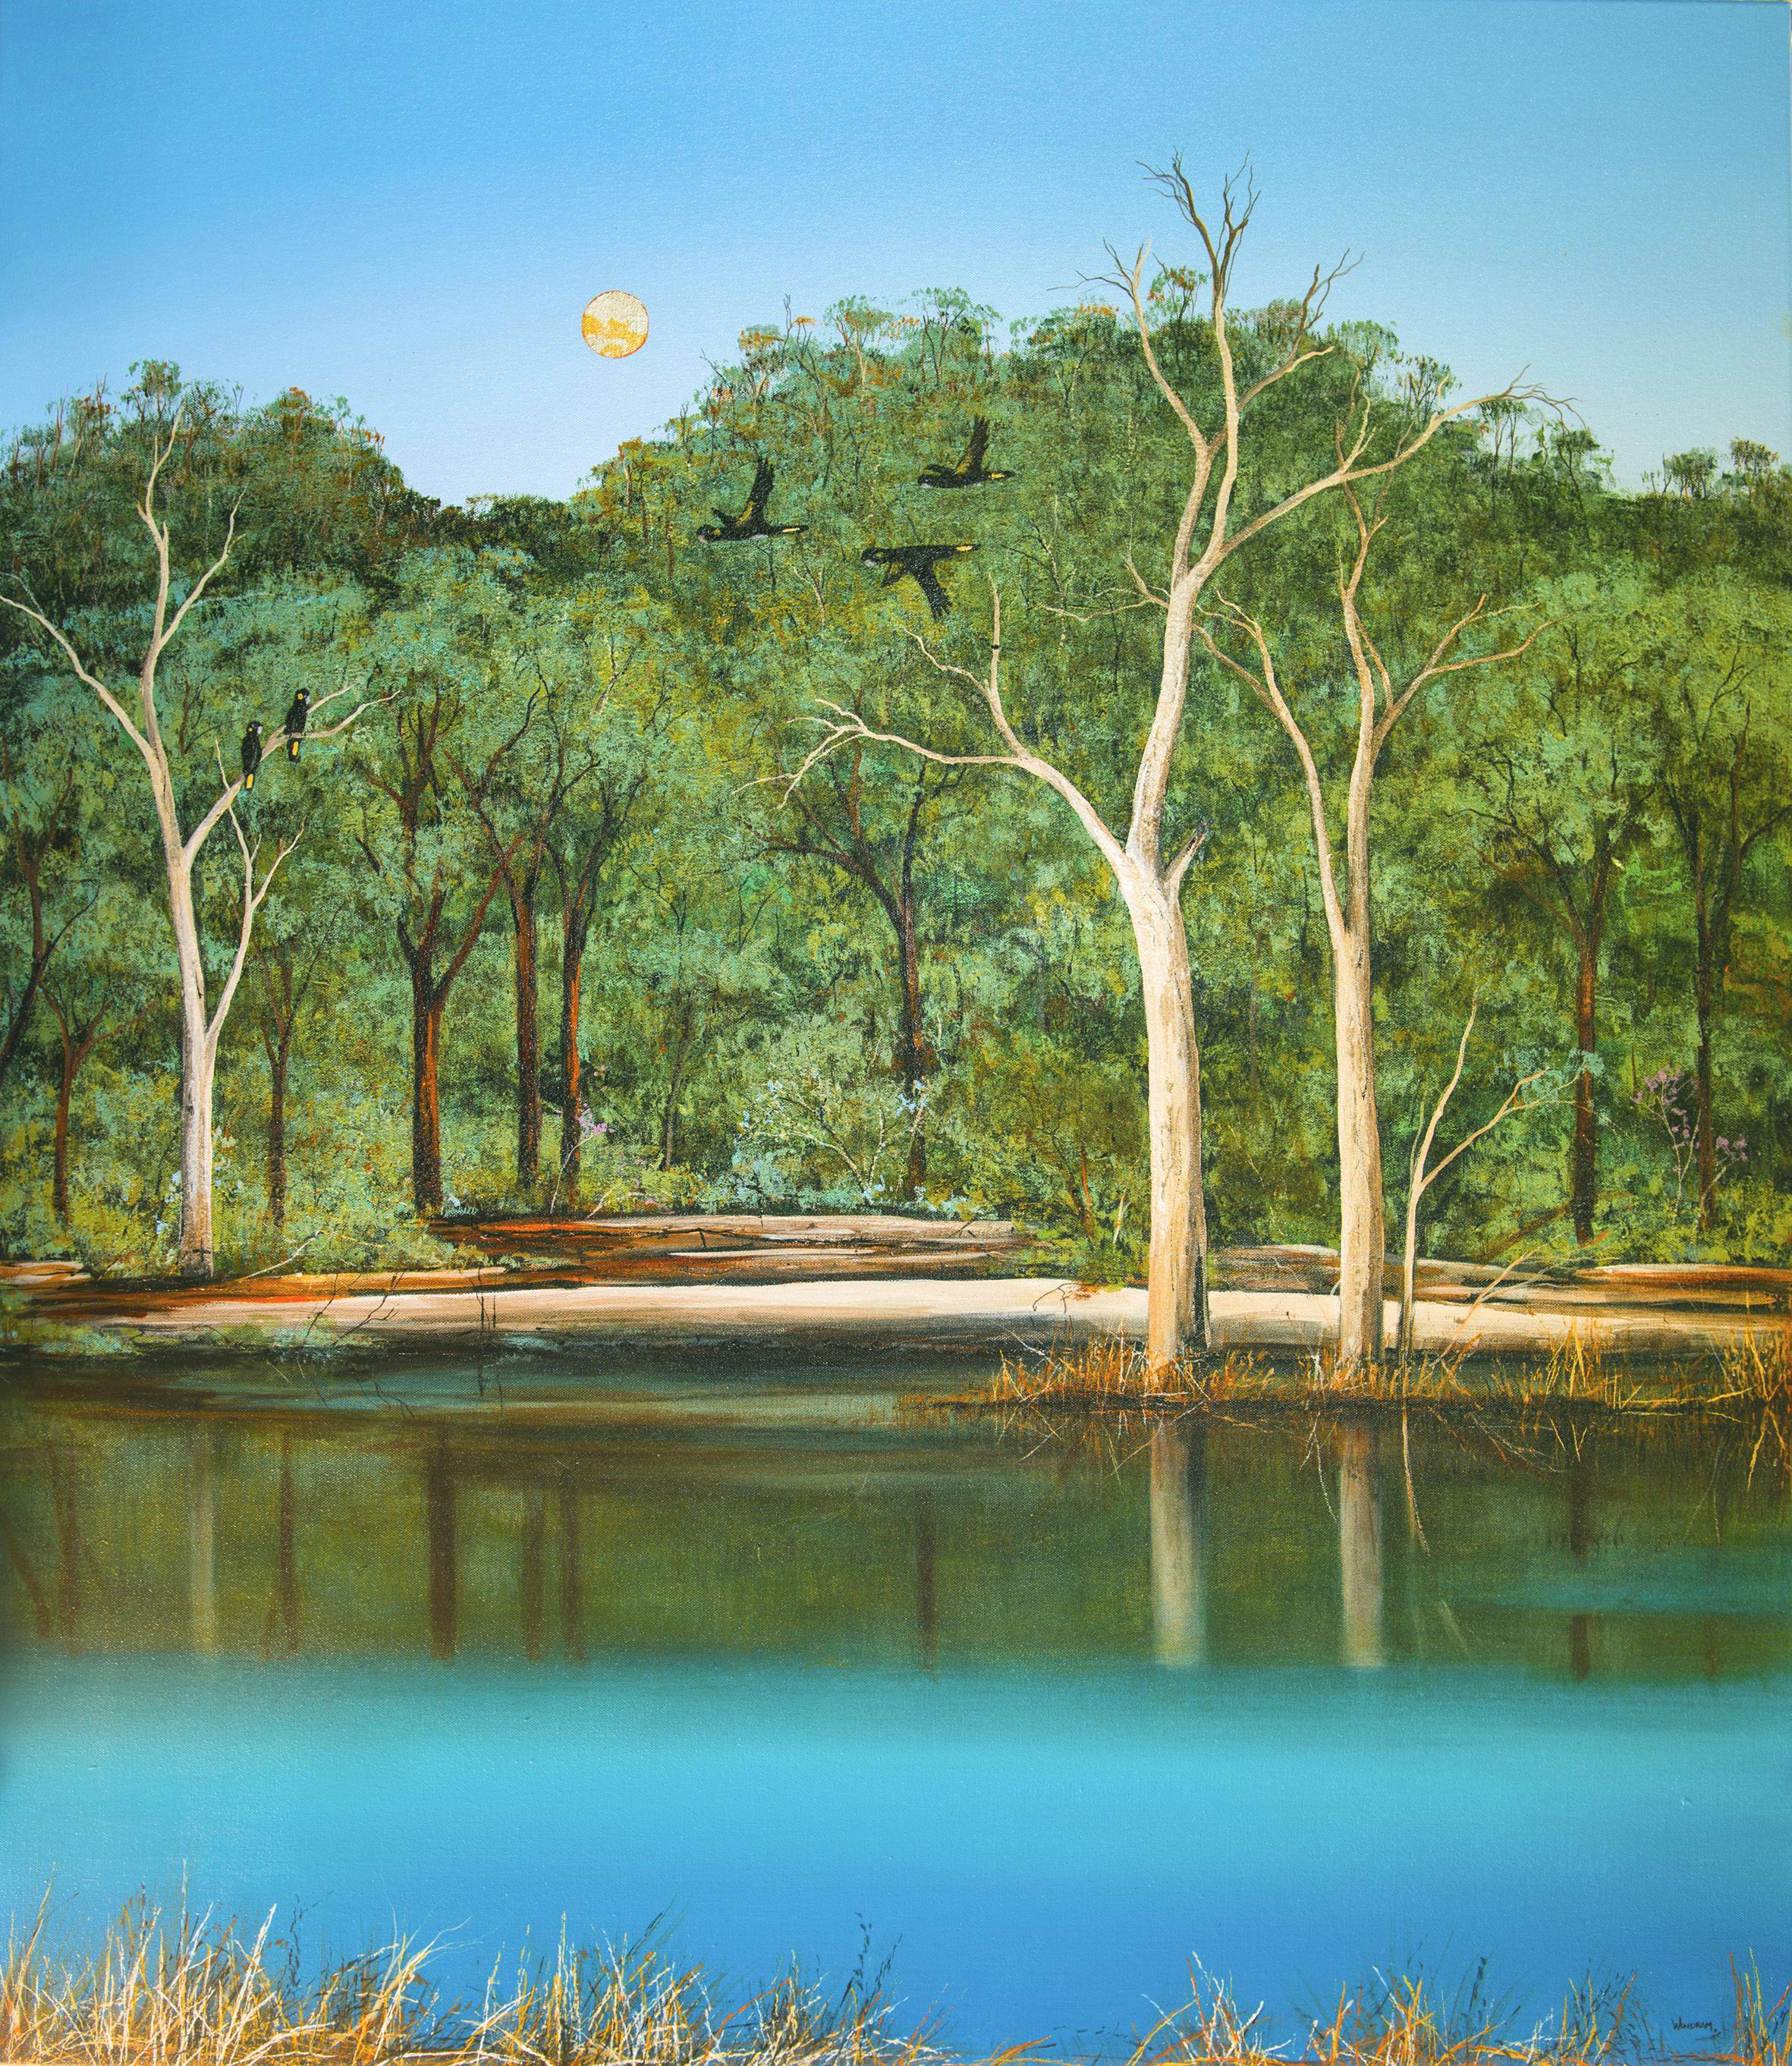 Ingrid Windram_Flright along the River_Acrylic_Canvas120cmW x 115cm H_2018.jpg